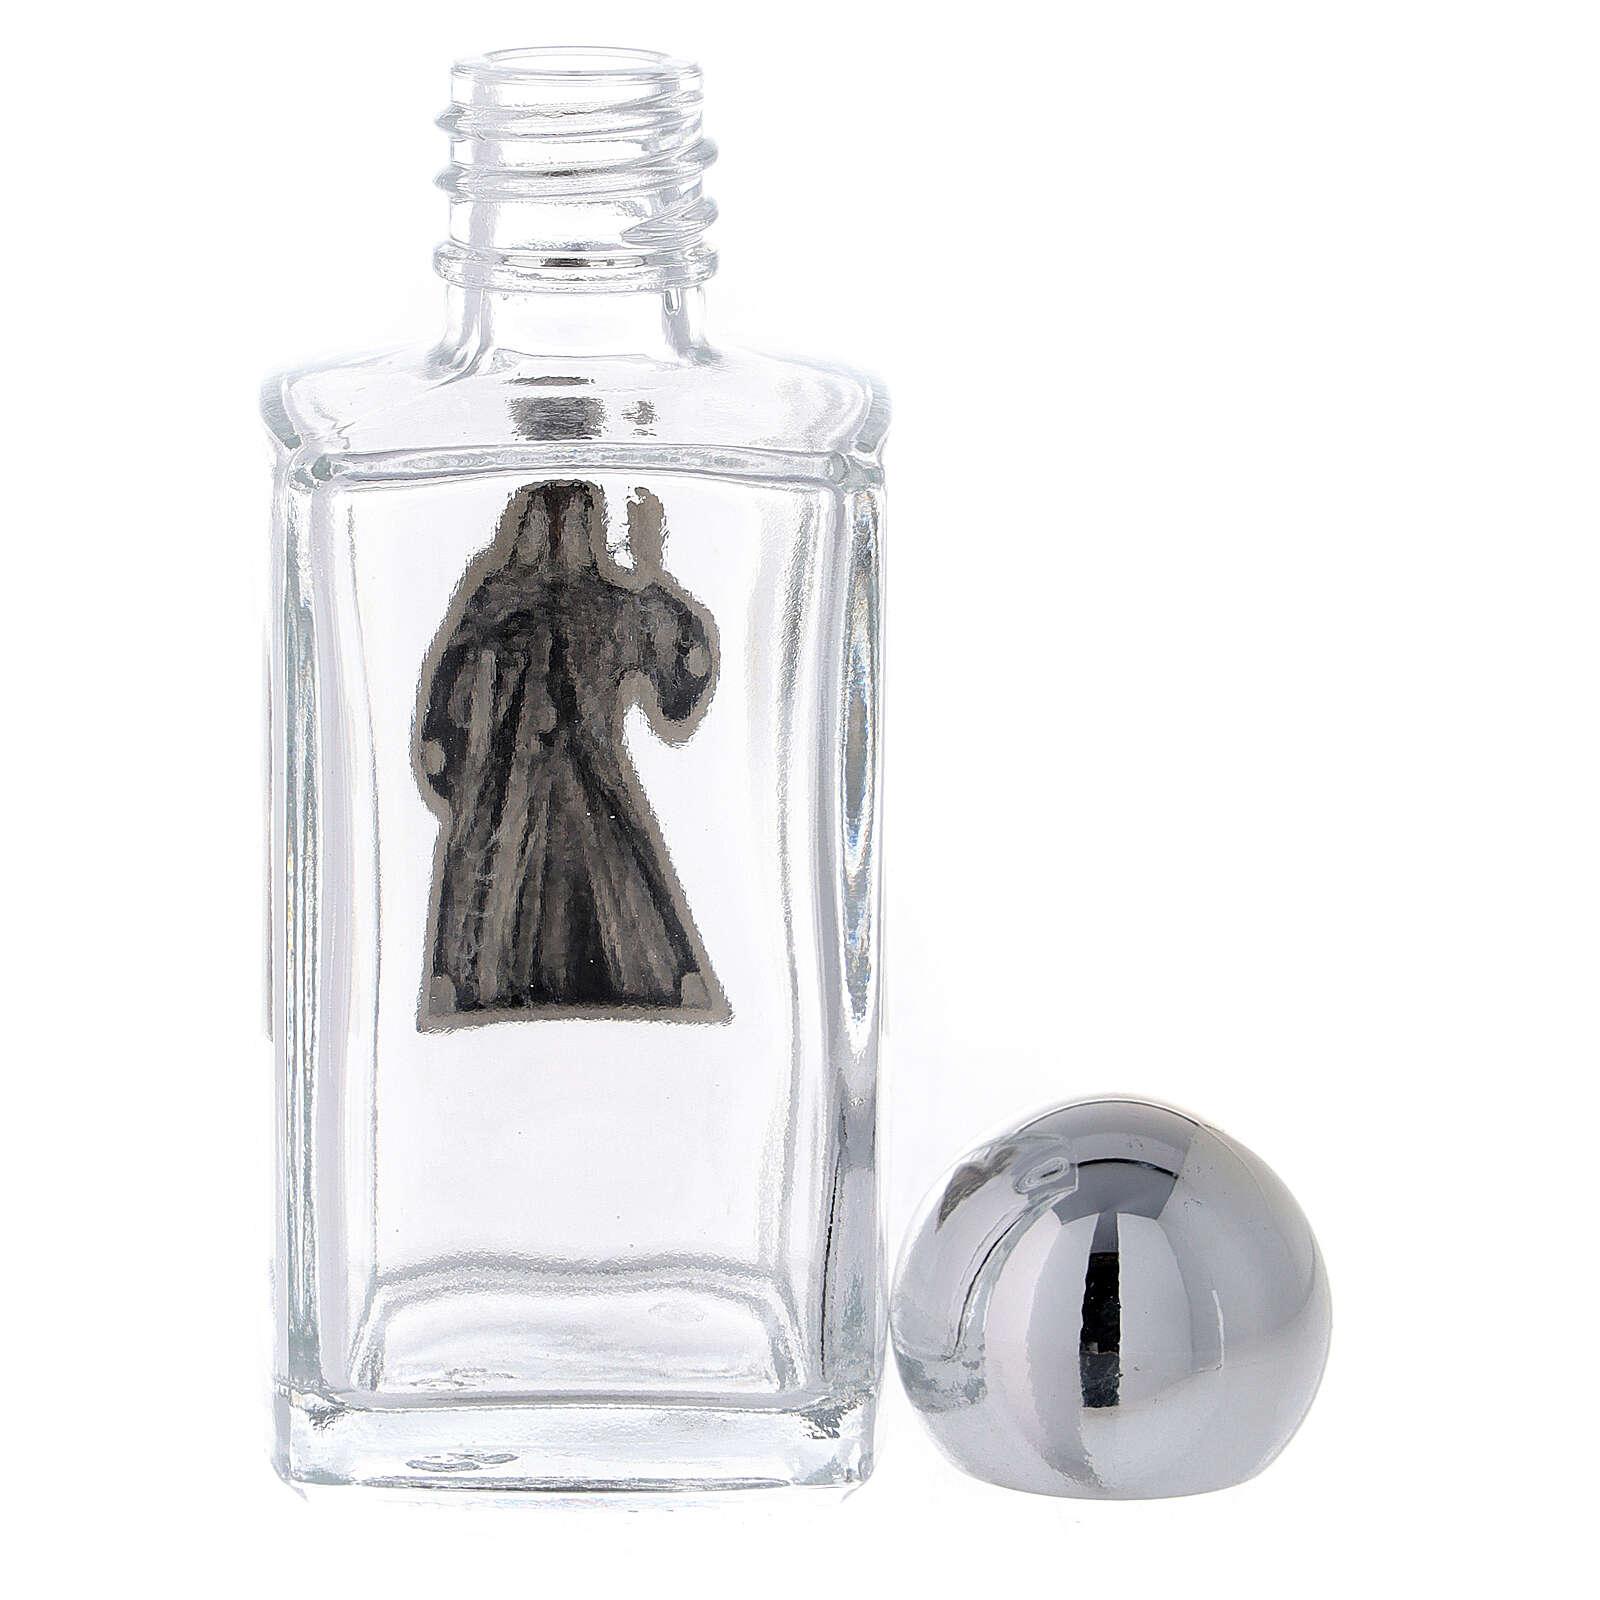 Bottiglietta acquasanta Gesù Misericordioso 50 ml (50 PZ) vetro 3